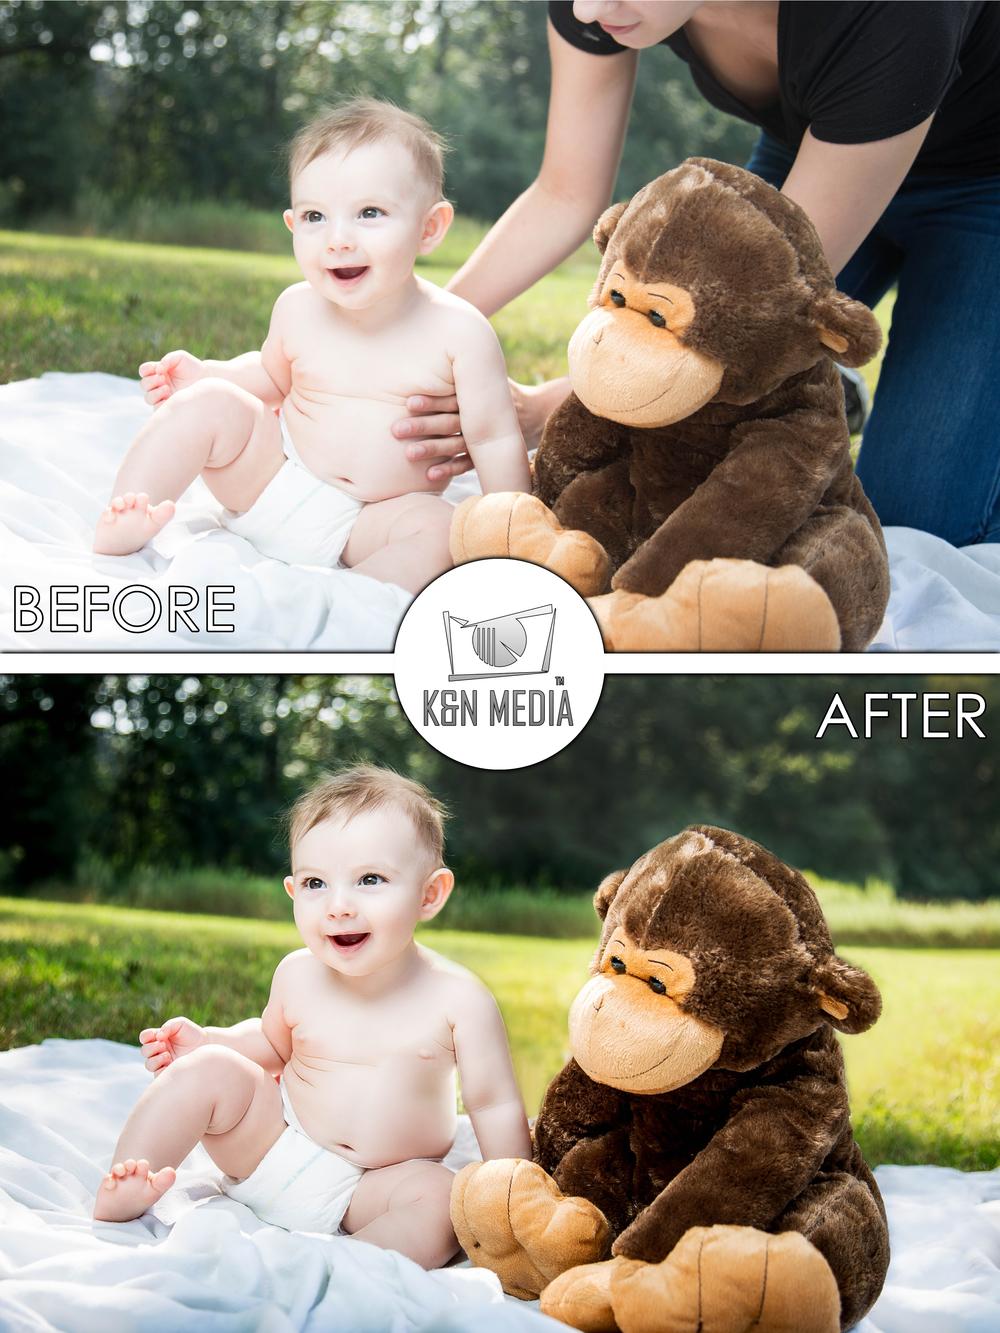 Julian Thomas Before & After Promotional Ad Image - K&N Media.jpg